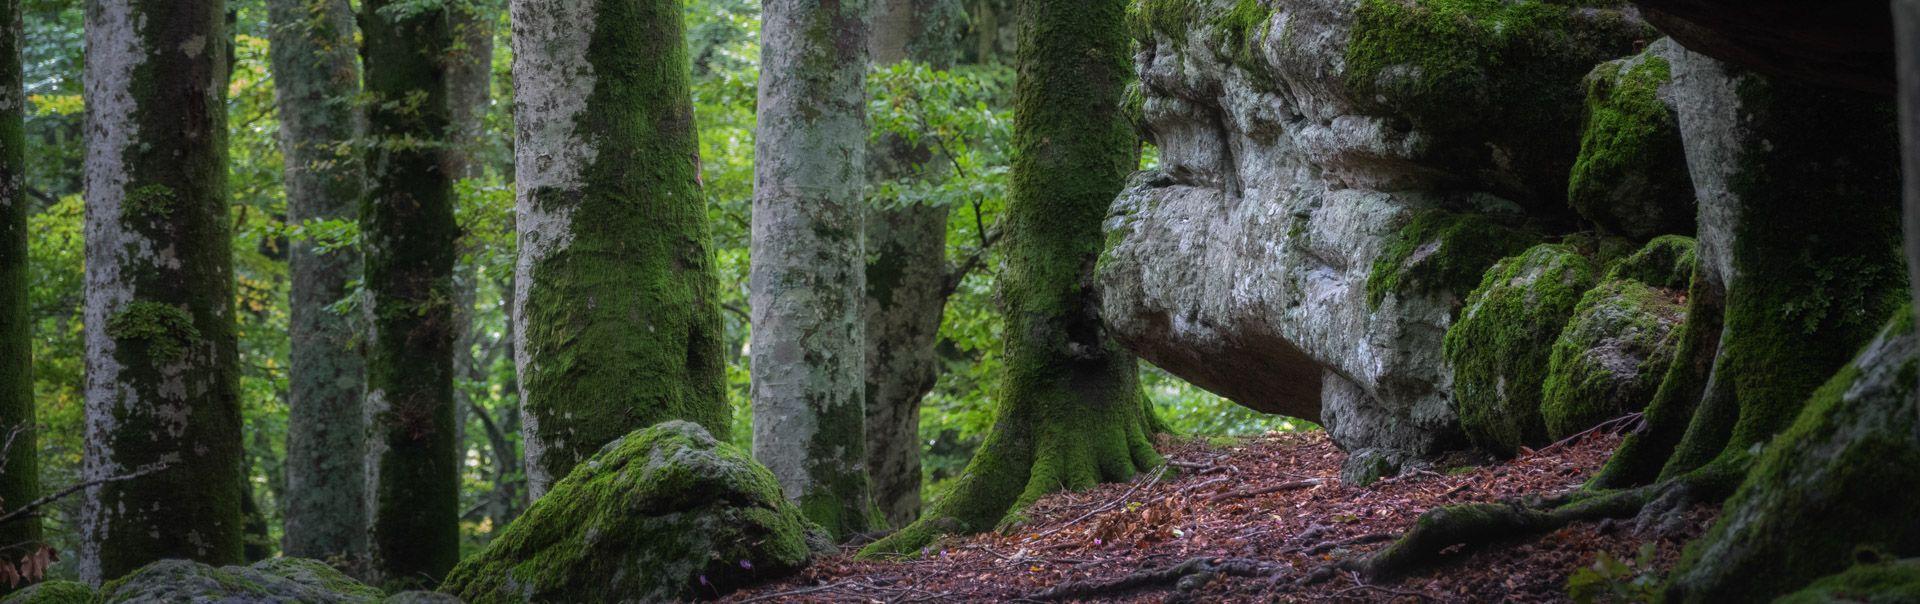 Monte Cimino beech forest